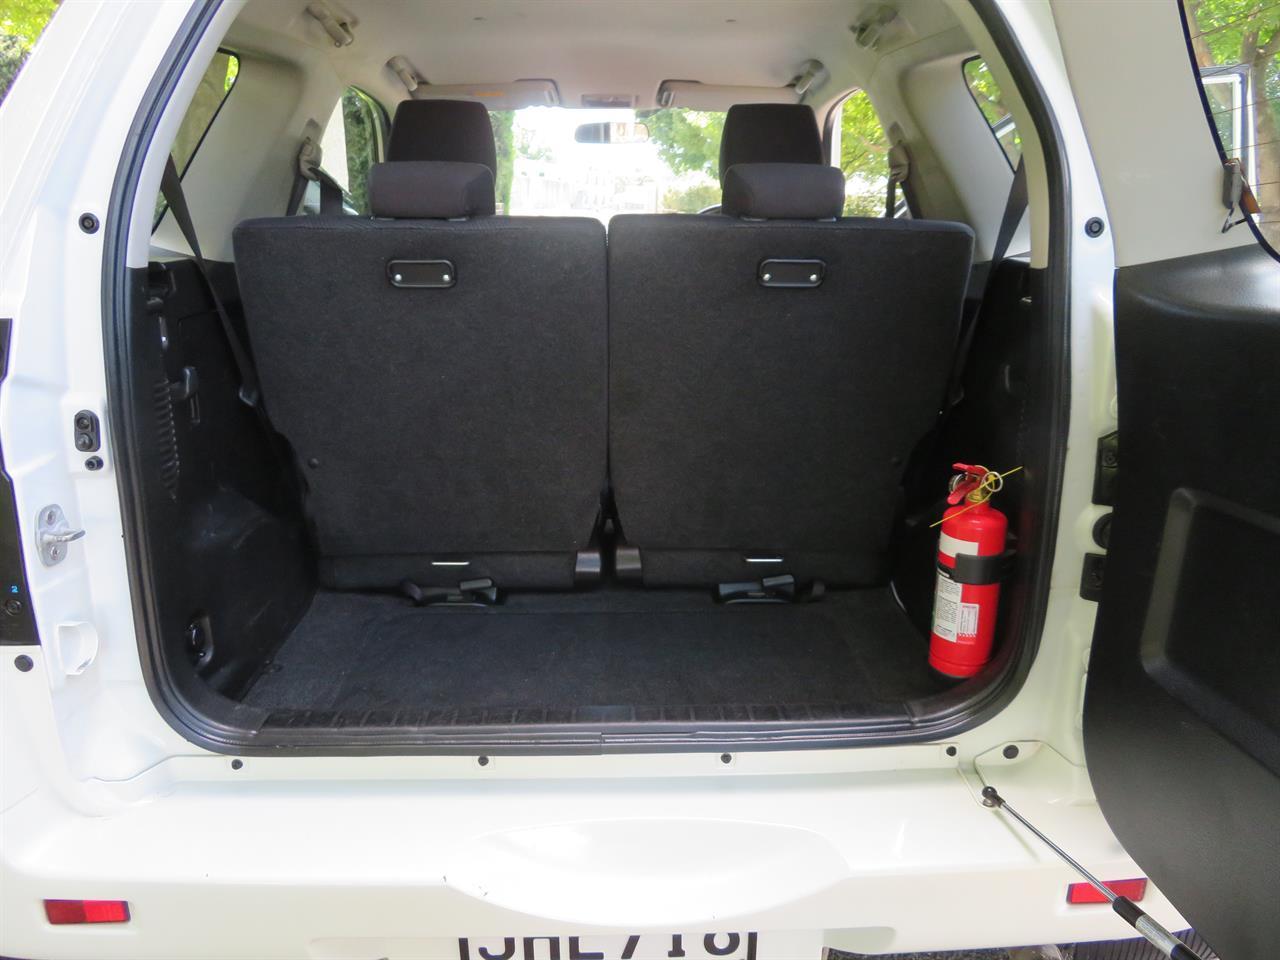 image-11, 2015 Suzuki GRAND VITARA VJLXAN 4WD at Gore